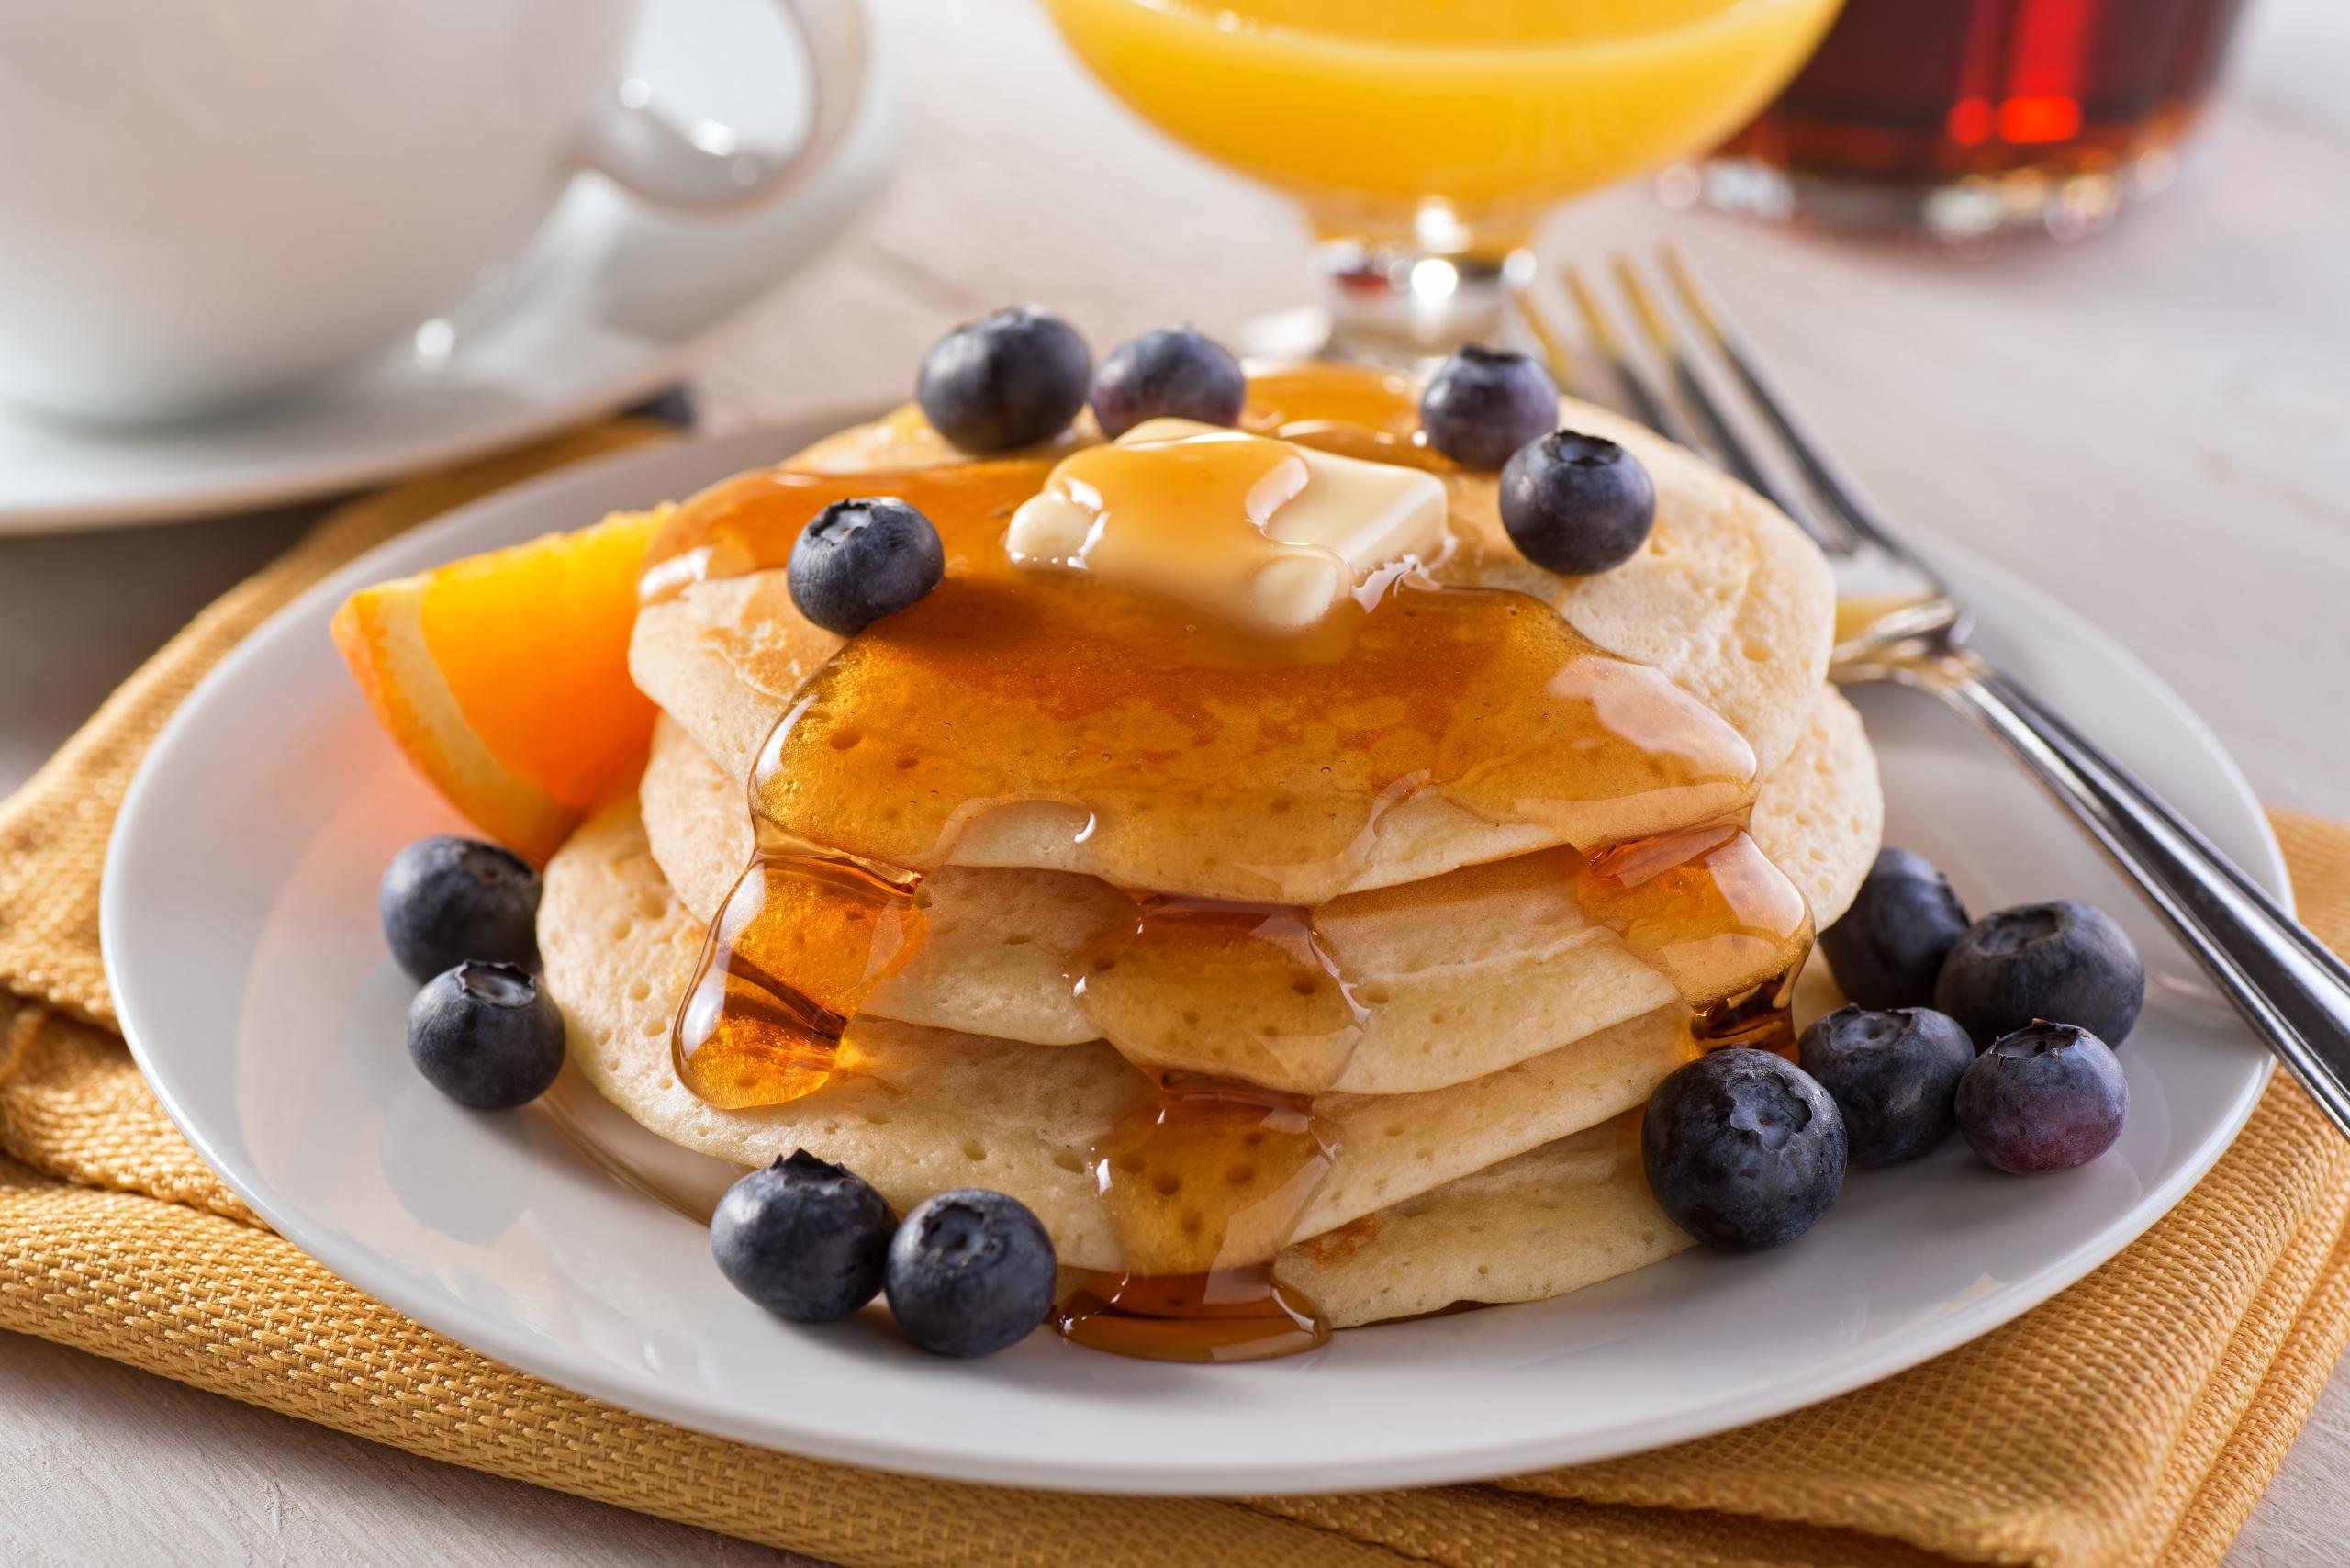 Картинка Мед Блины Черника Еда Тарелка 2560x1708 Пища тарелке Продукты питания